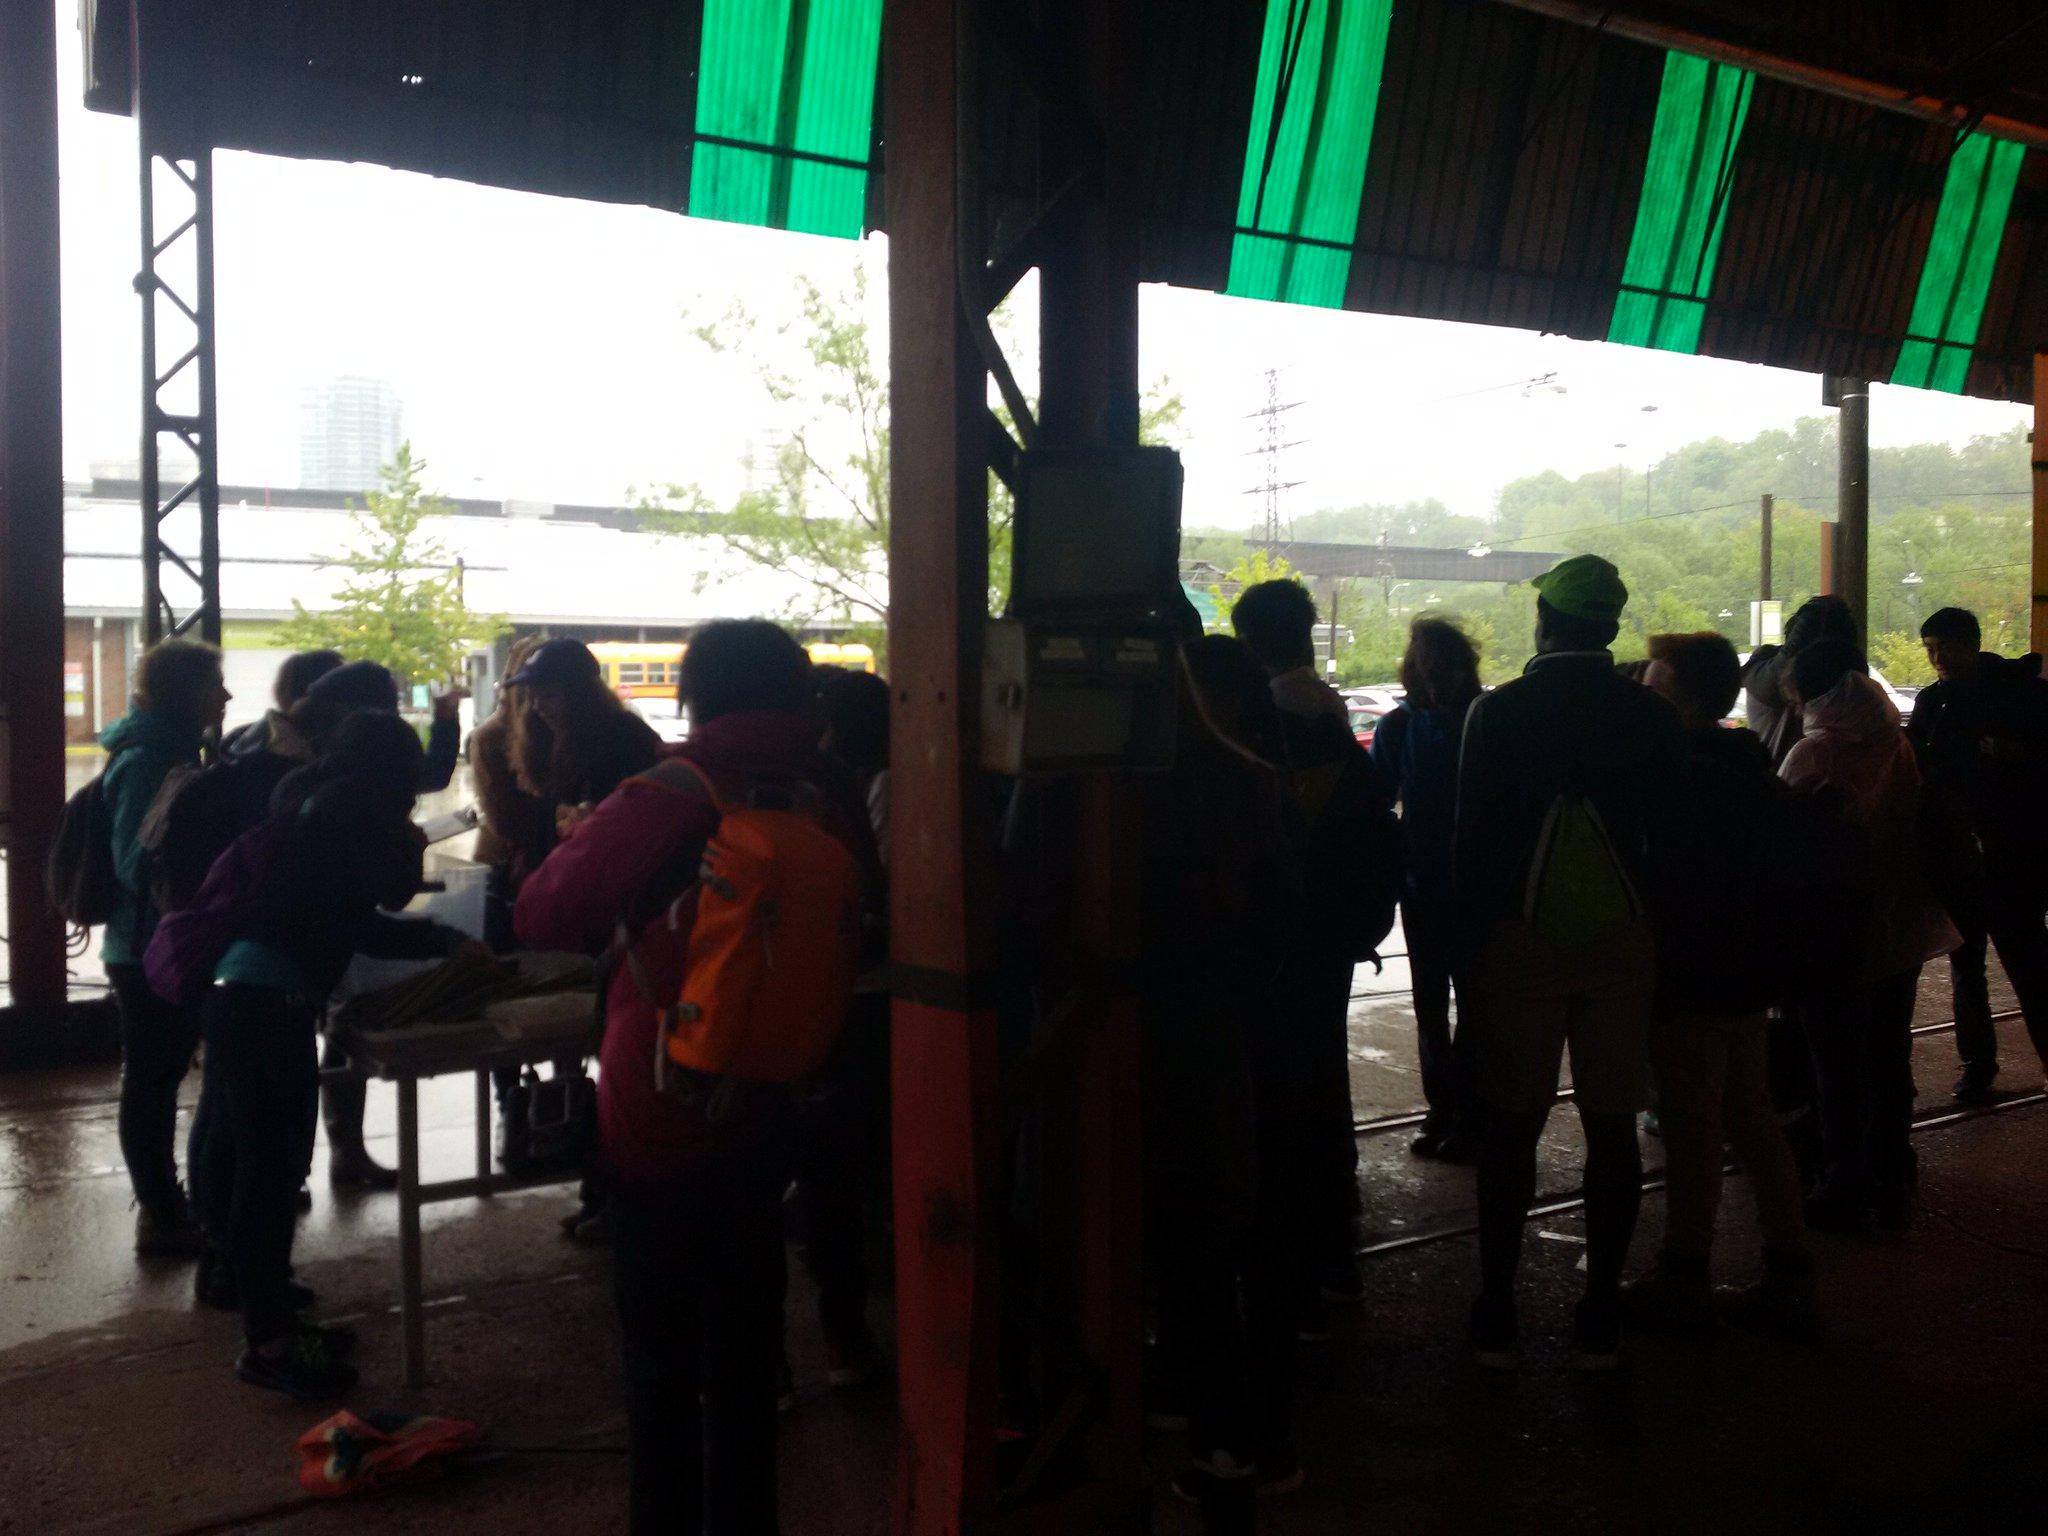 Despite the rain #yas2017 is kicking off!!! @torontoyec @EGbrickworks @EvergreenCanada @HSBC_CA https://t.co/FpLu9HHZgd